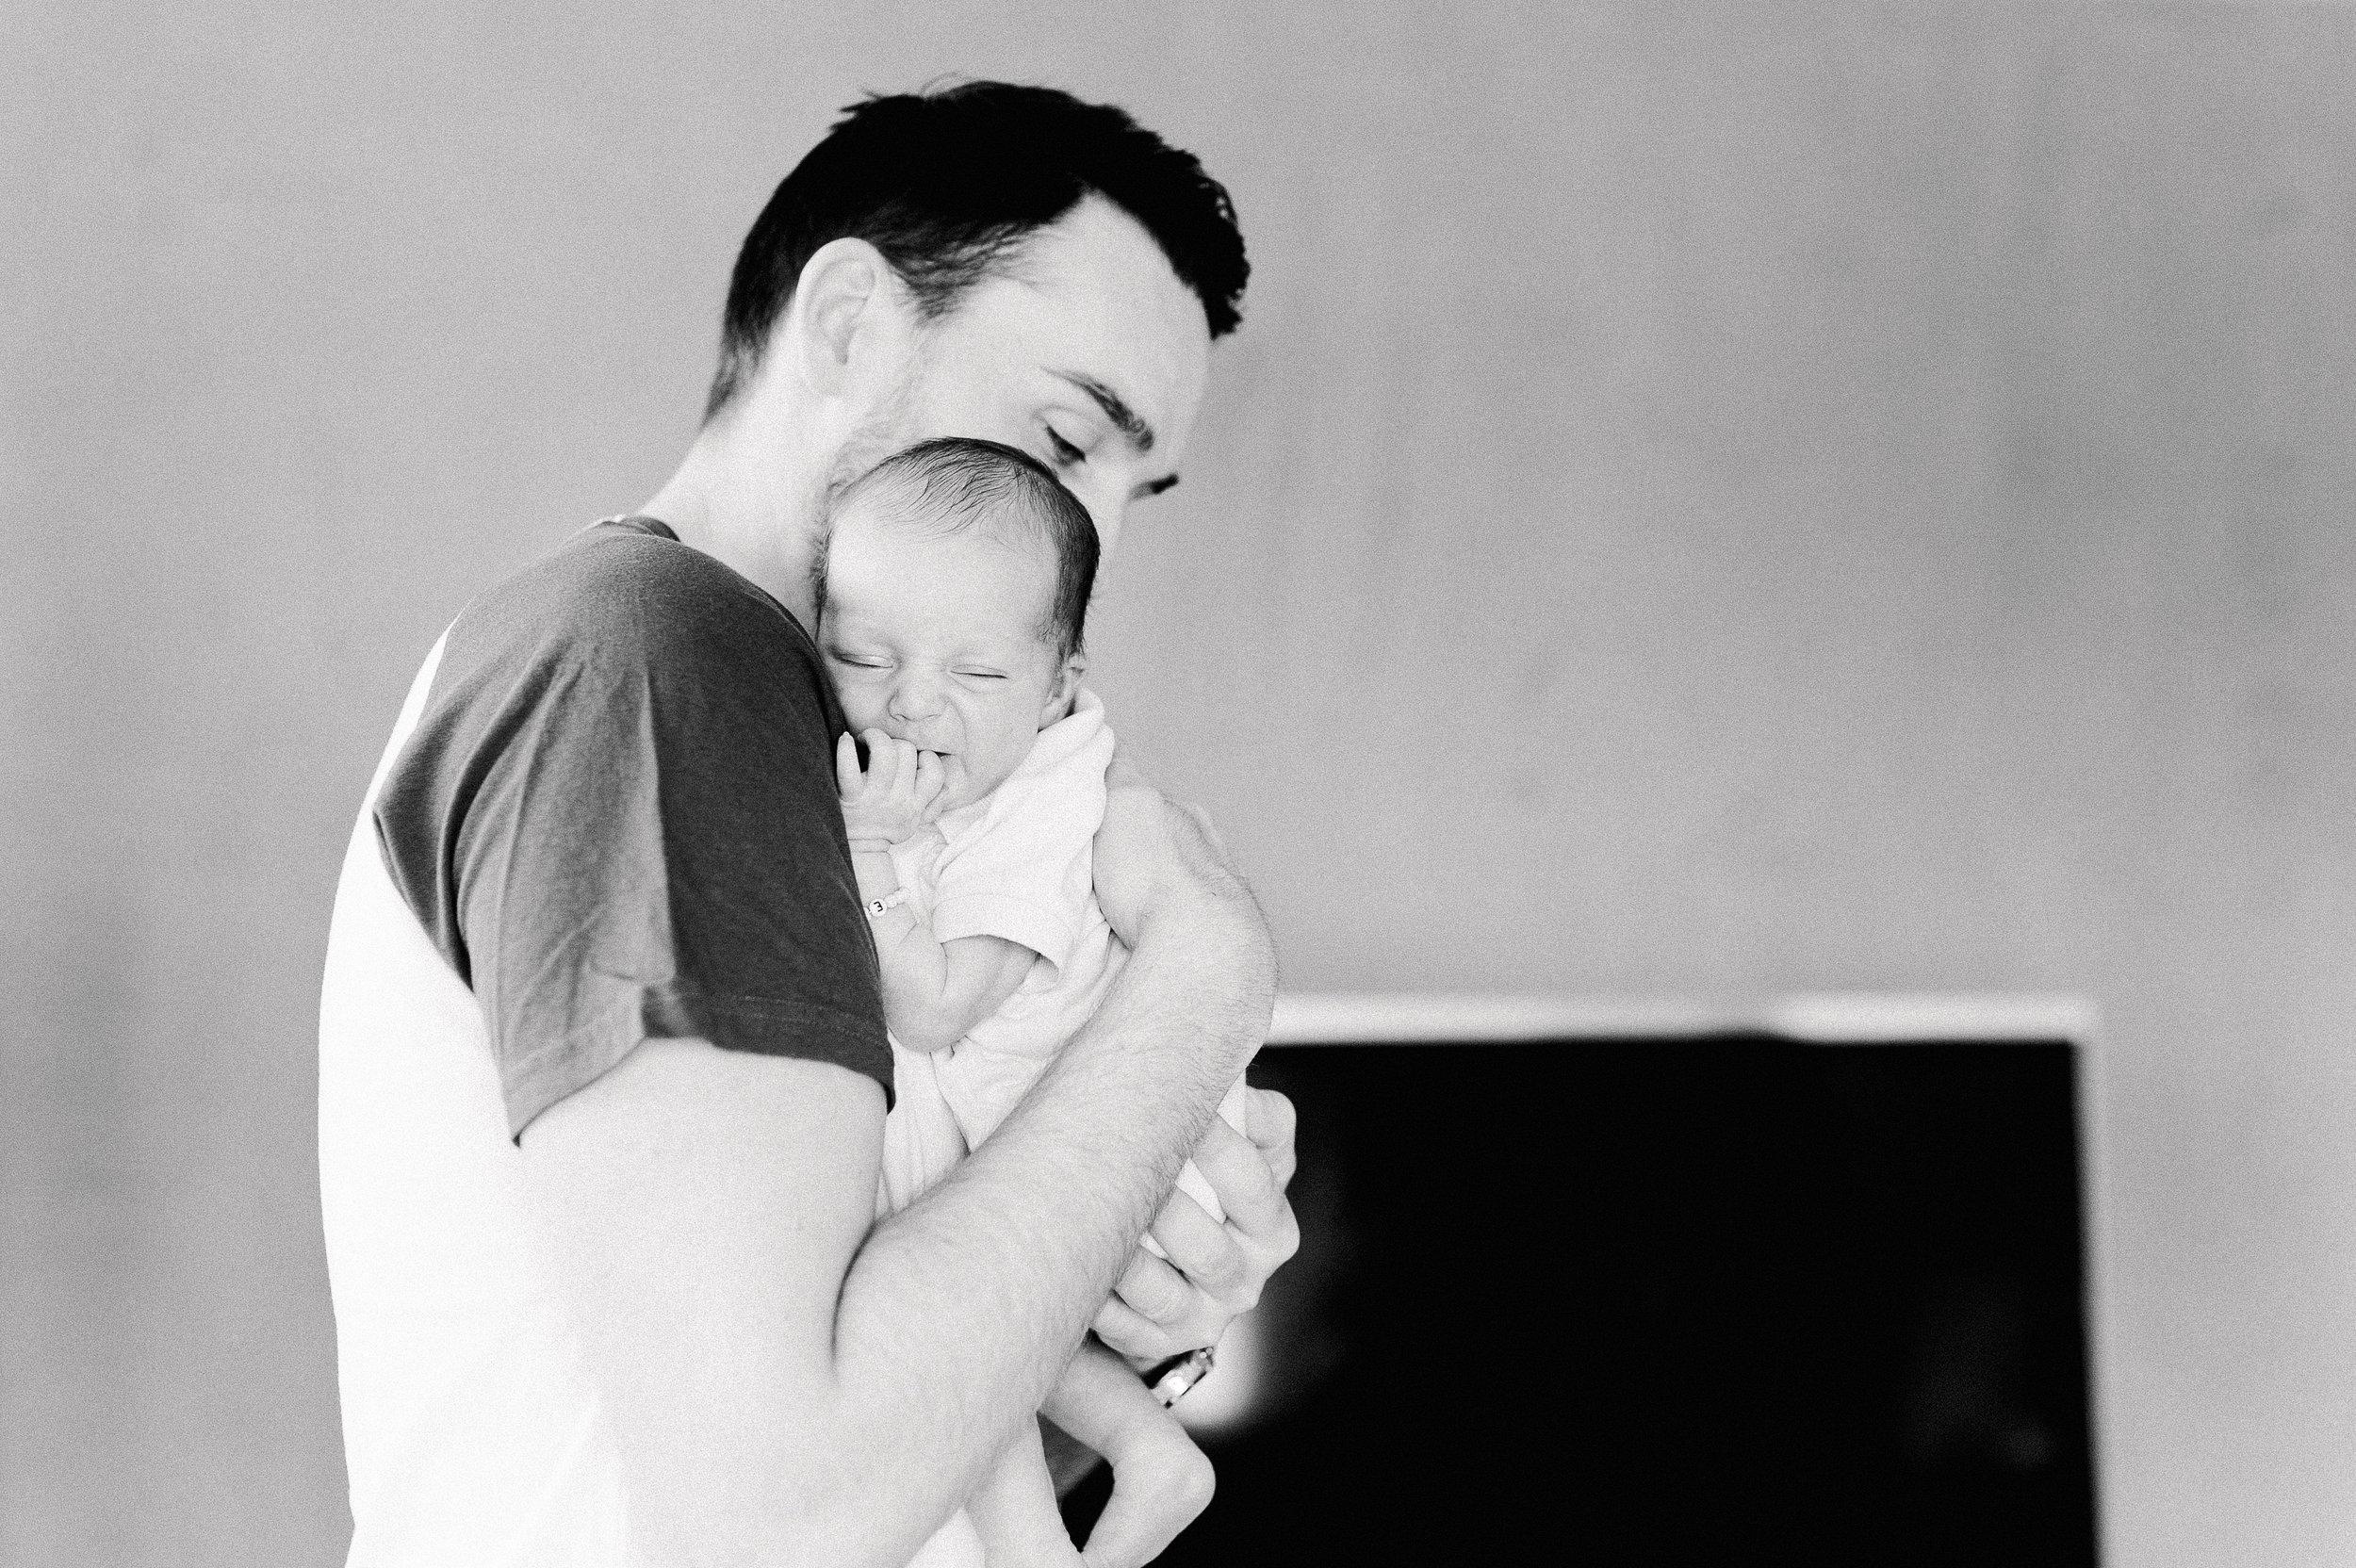 Anna-Hari-Photography-Familienshooting-Neugeborenenshooting-Mannheim-Heidelberg12.jpg